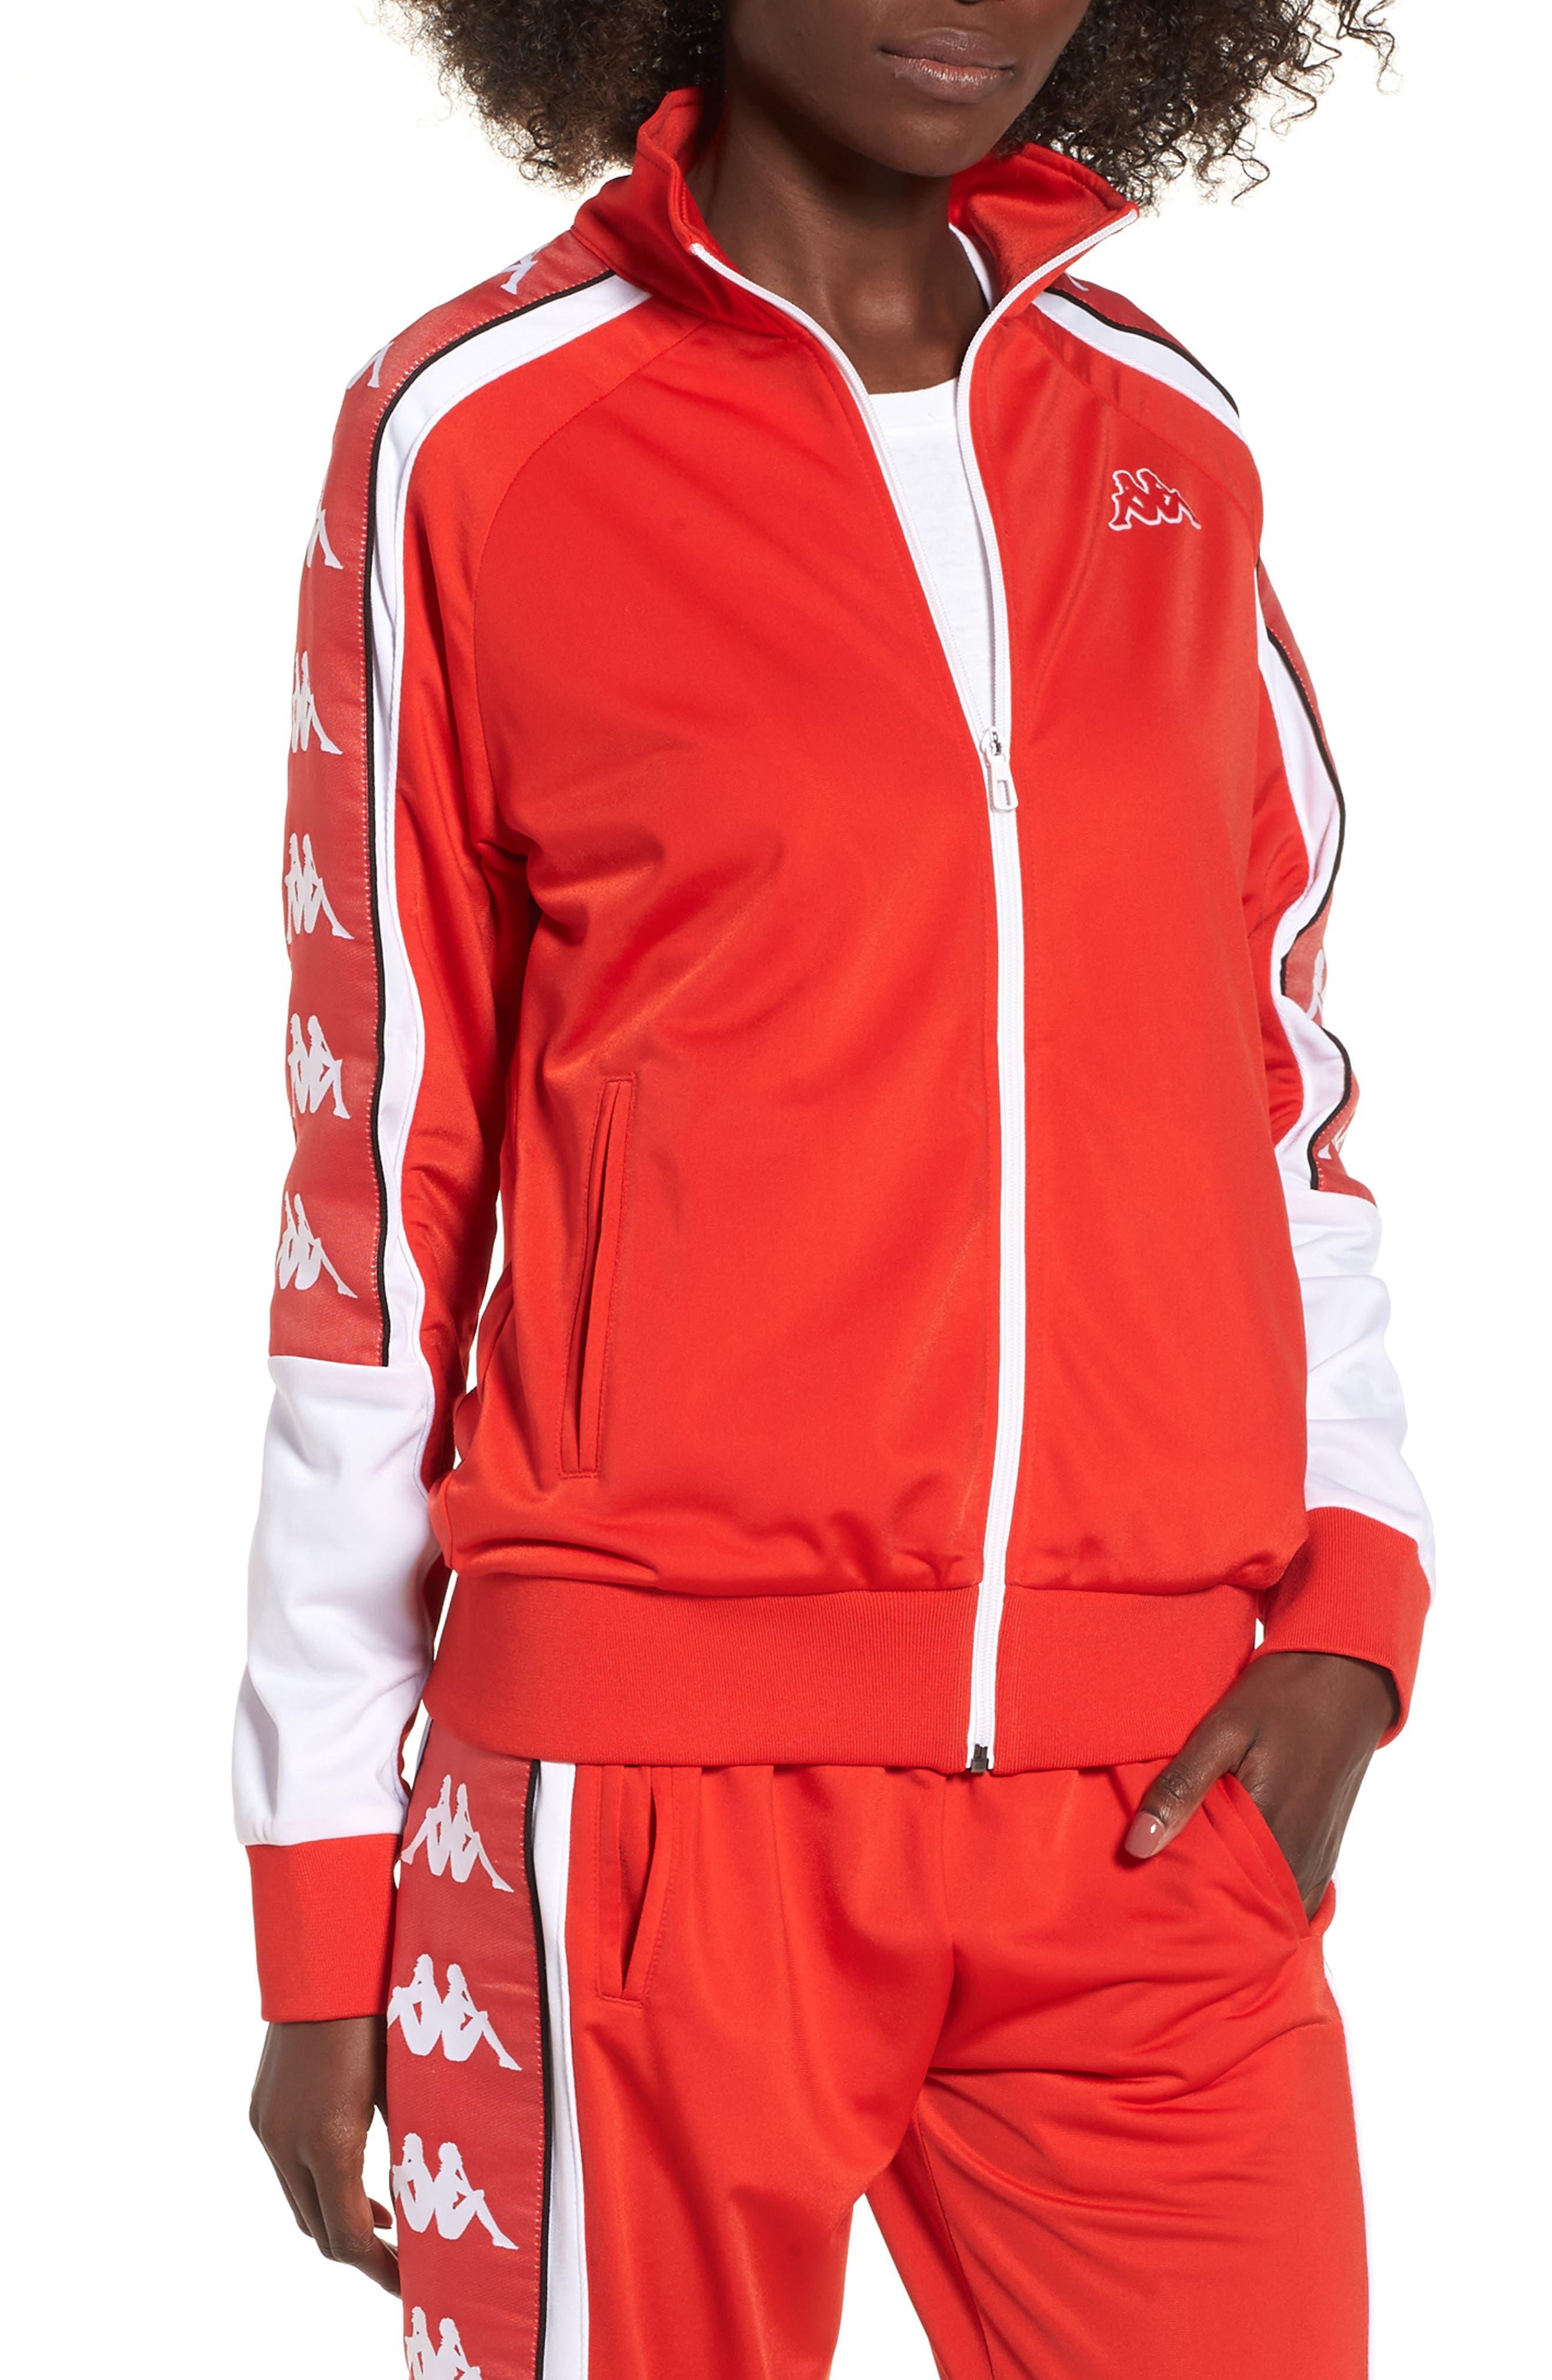 222 Banda 10 Anay Jacket,                         Main,                         color, Red Flame -White